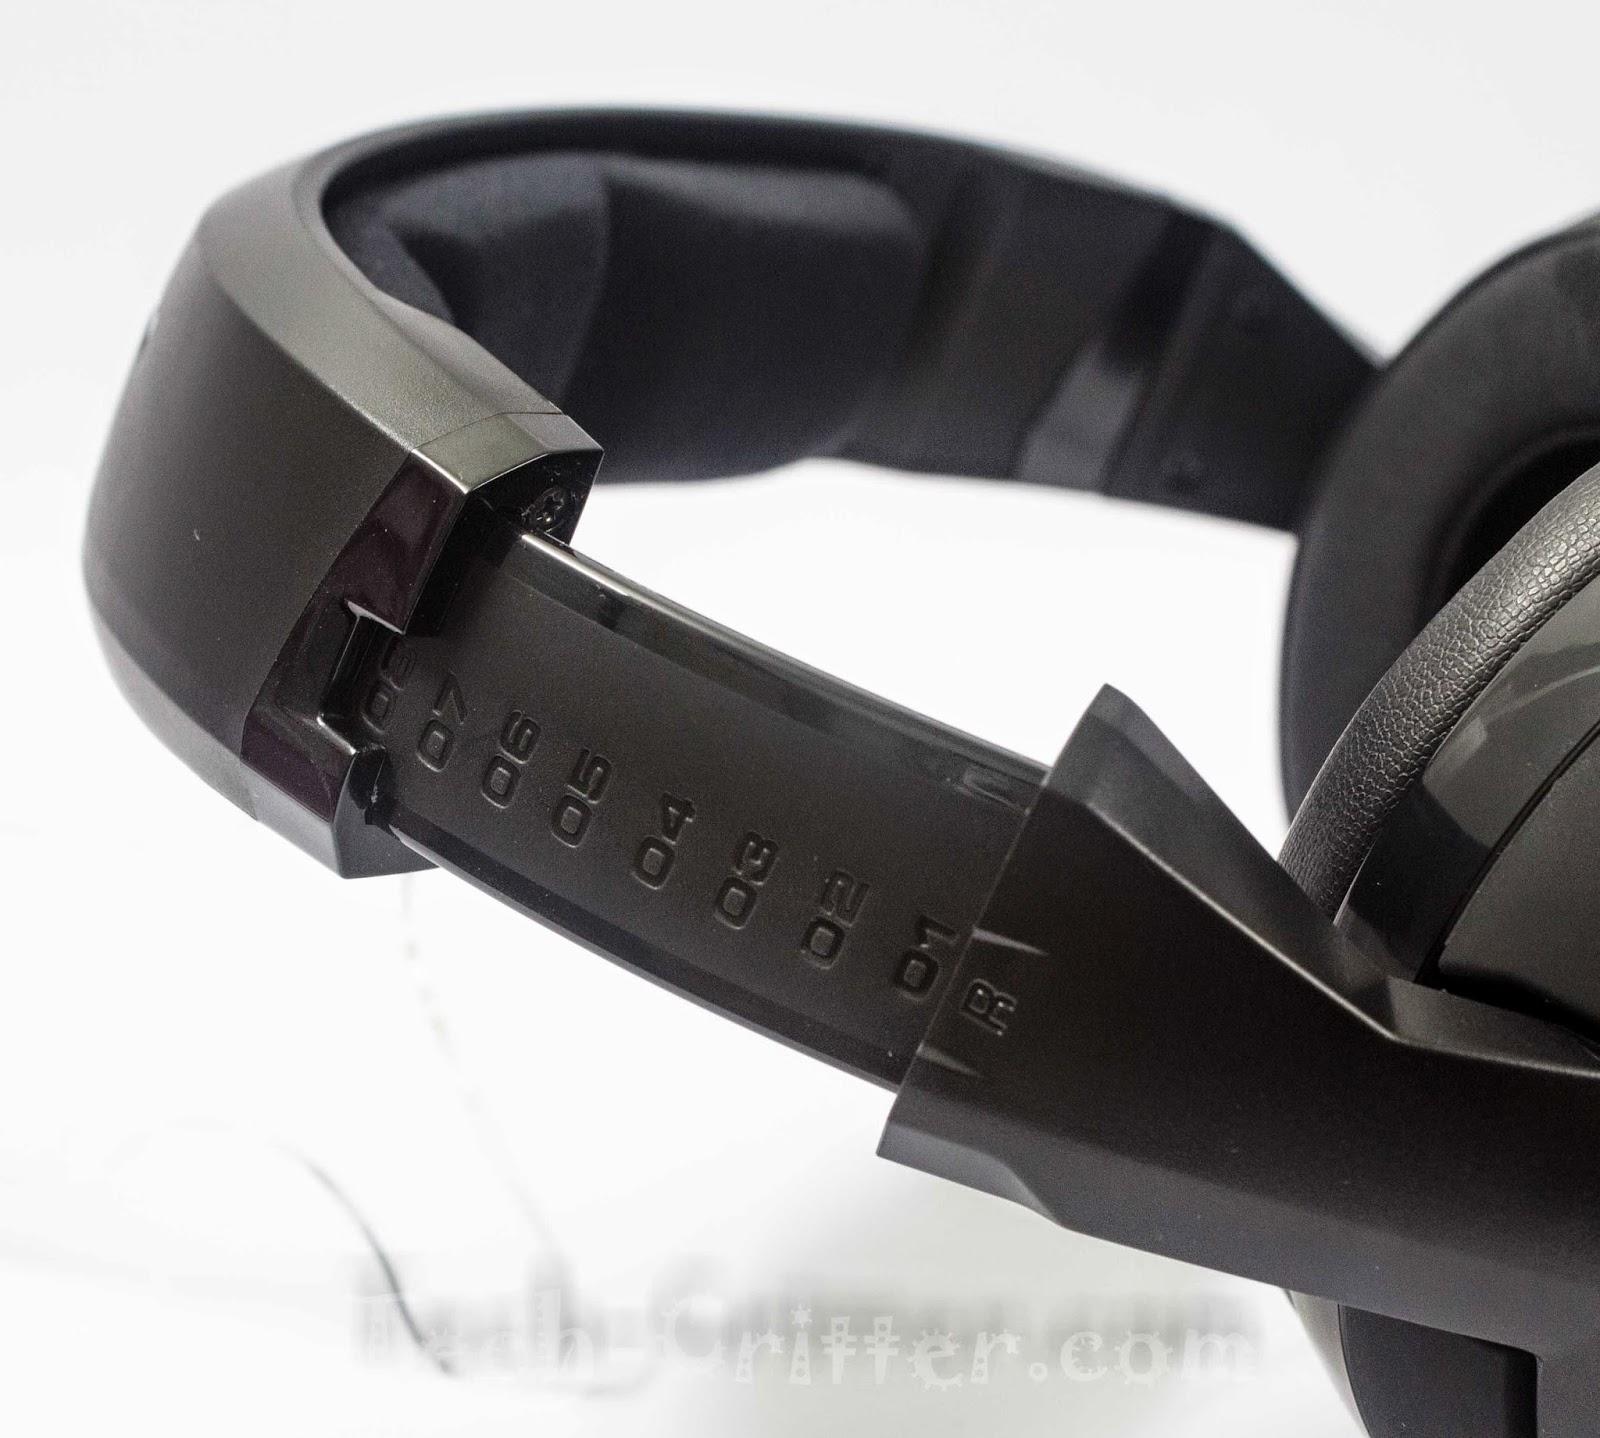 Unboxing & Review: Roccat Kave XTD 5.1 Digital Surround Sound Headset 73